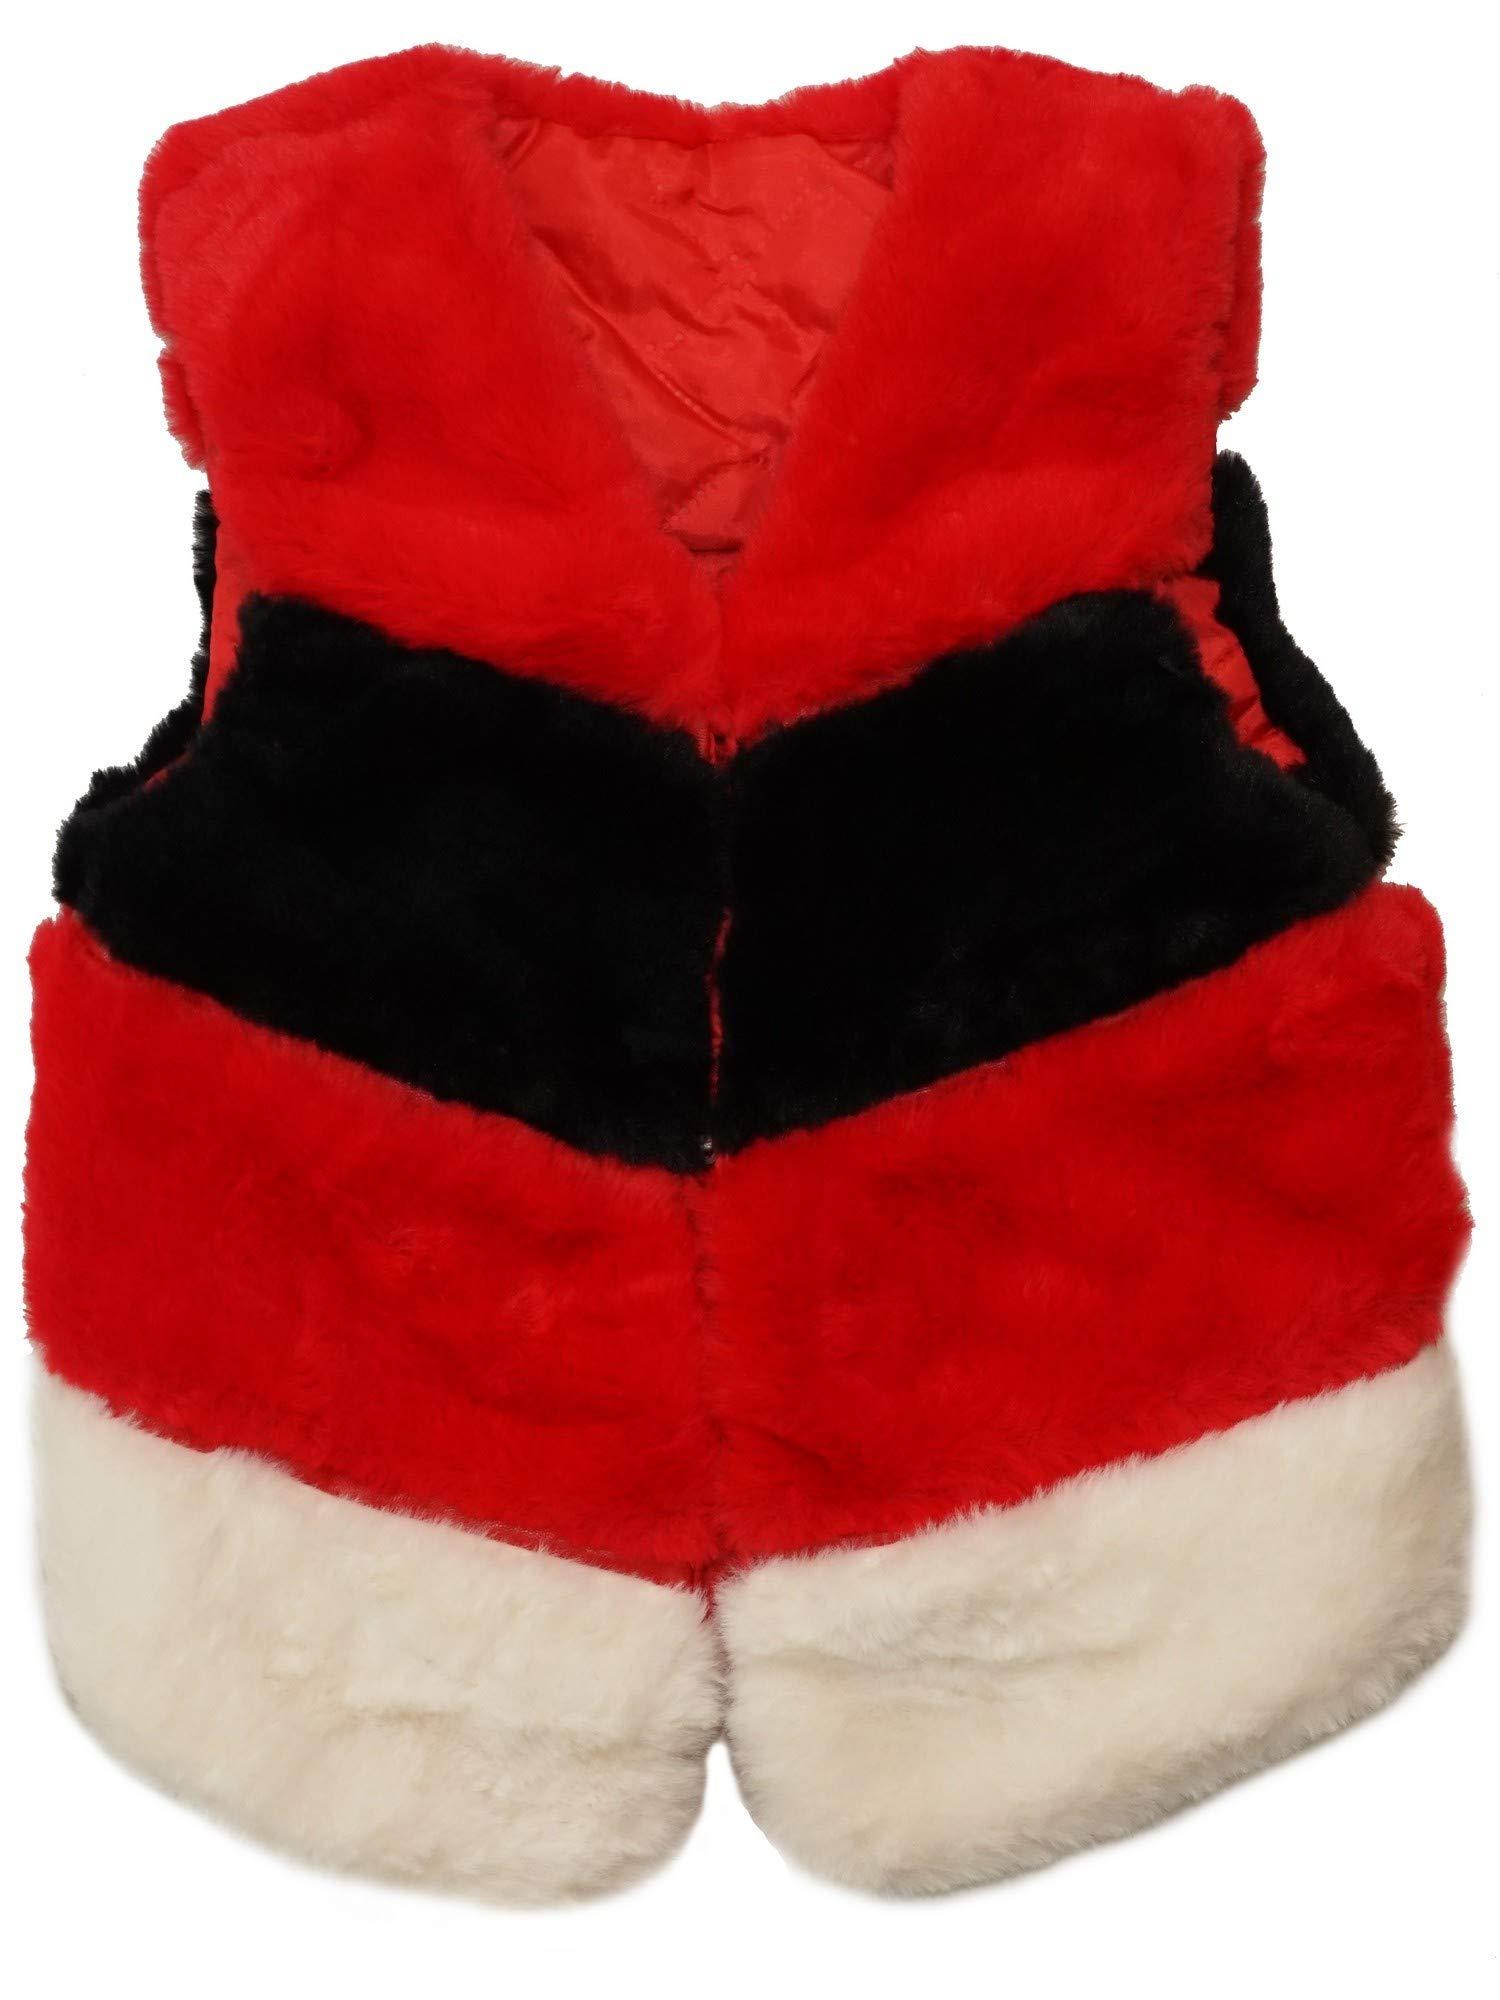 wenchoice Baby Girls Red Black White Panel Soft Plush Sleeveless Vest 9-24M by wenchoice